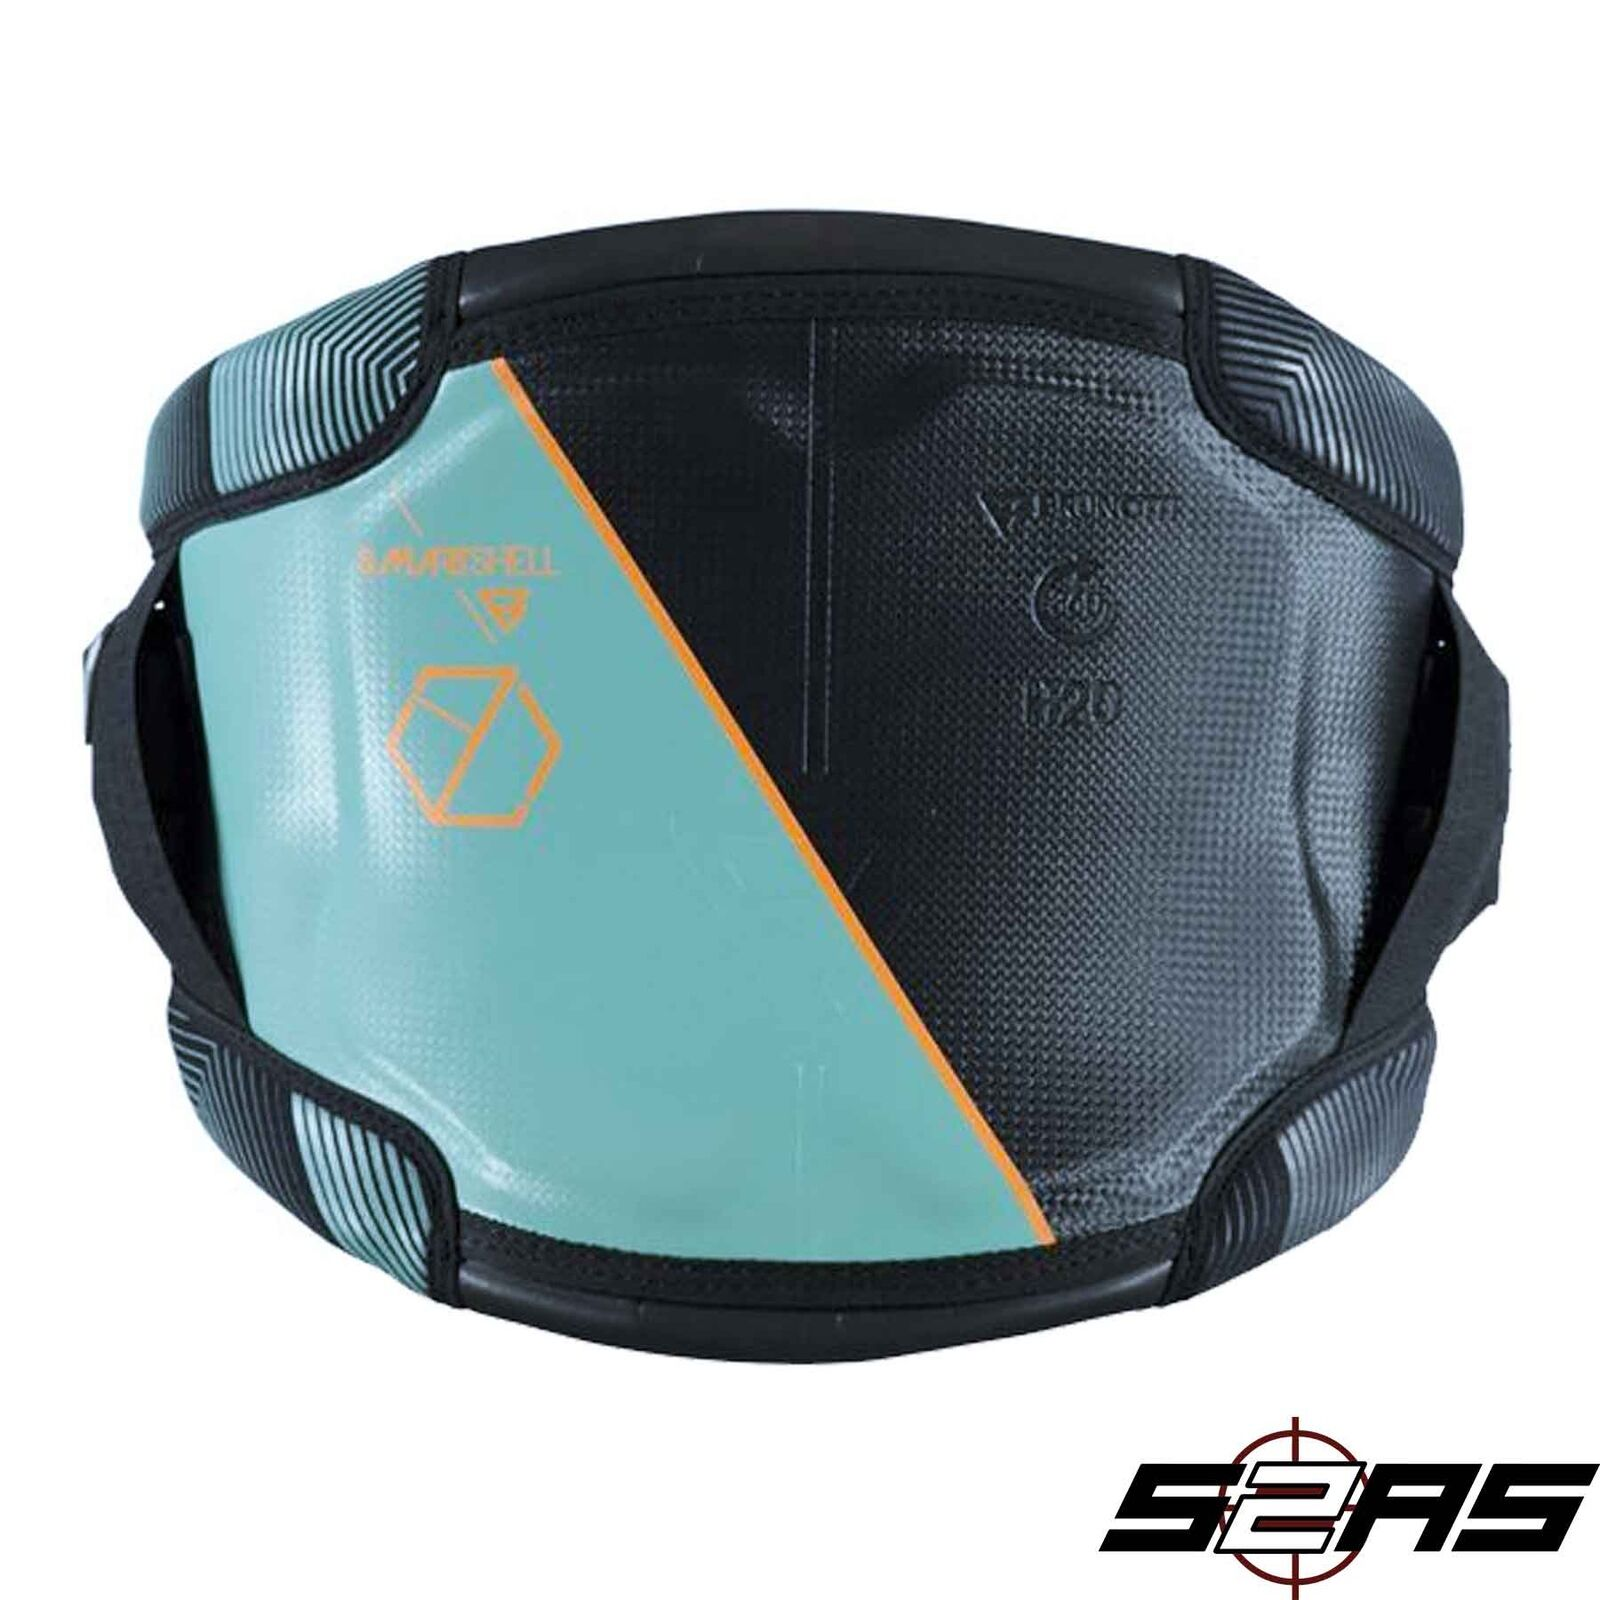 2018 Brunotti Smartshell 360 Youri Zoon Multi-Use Harness